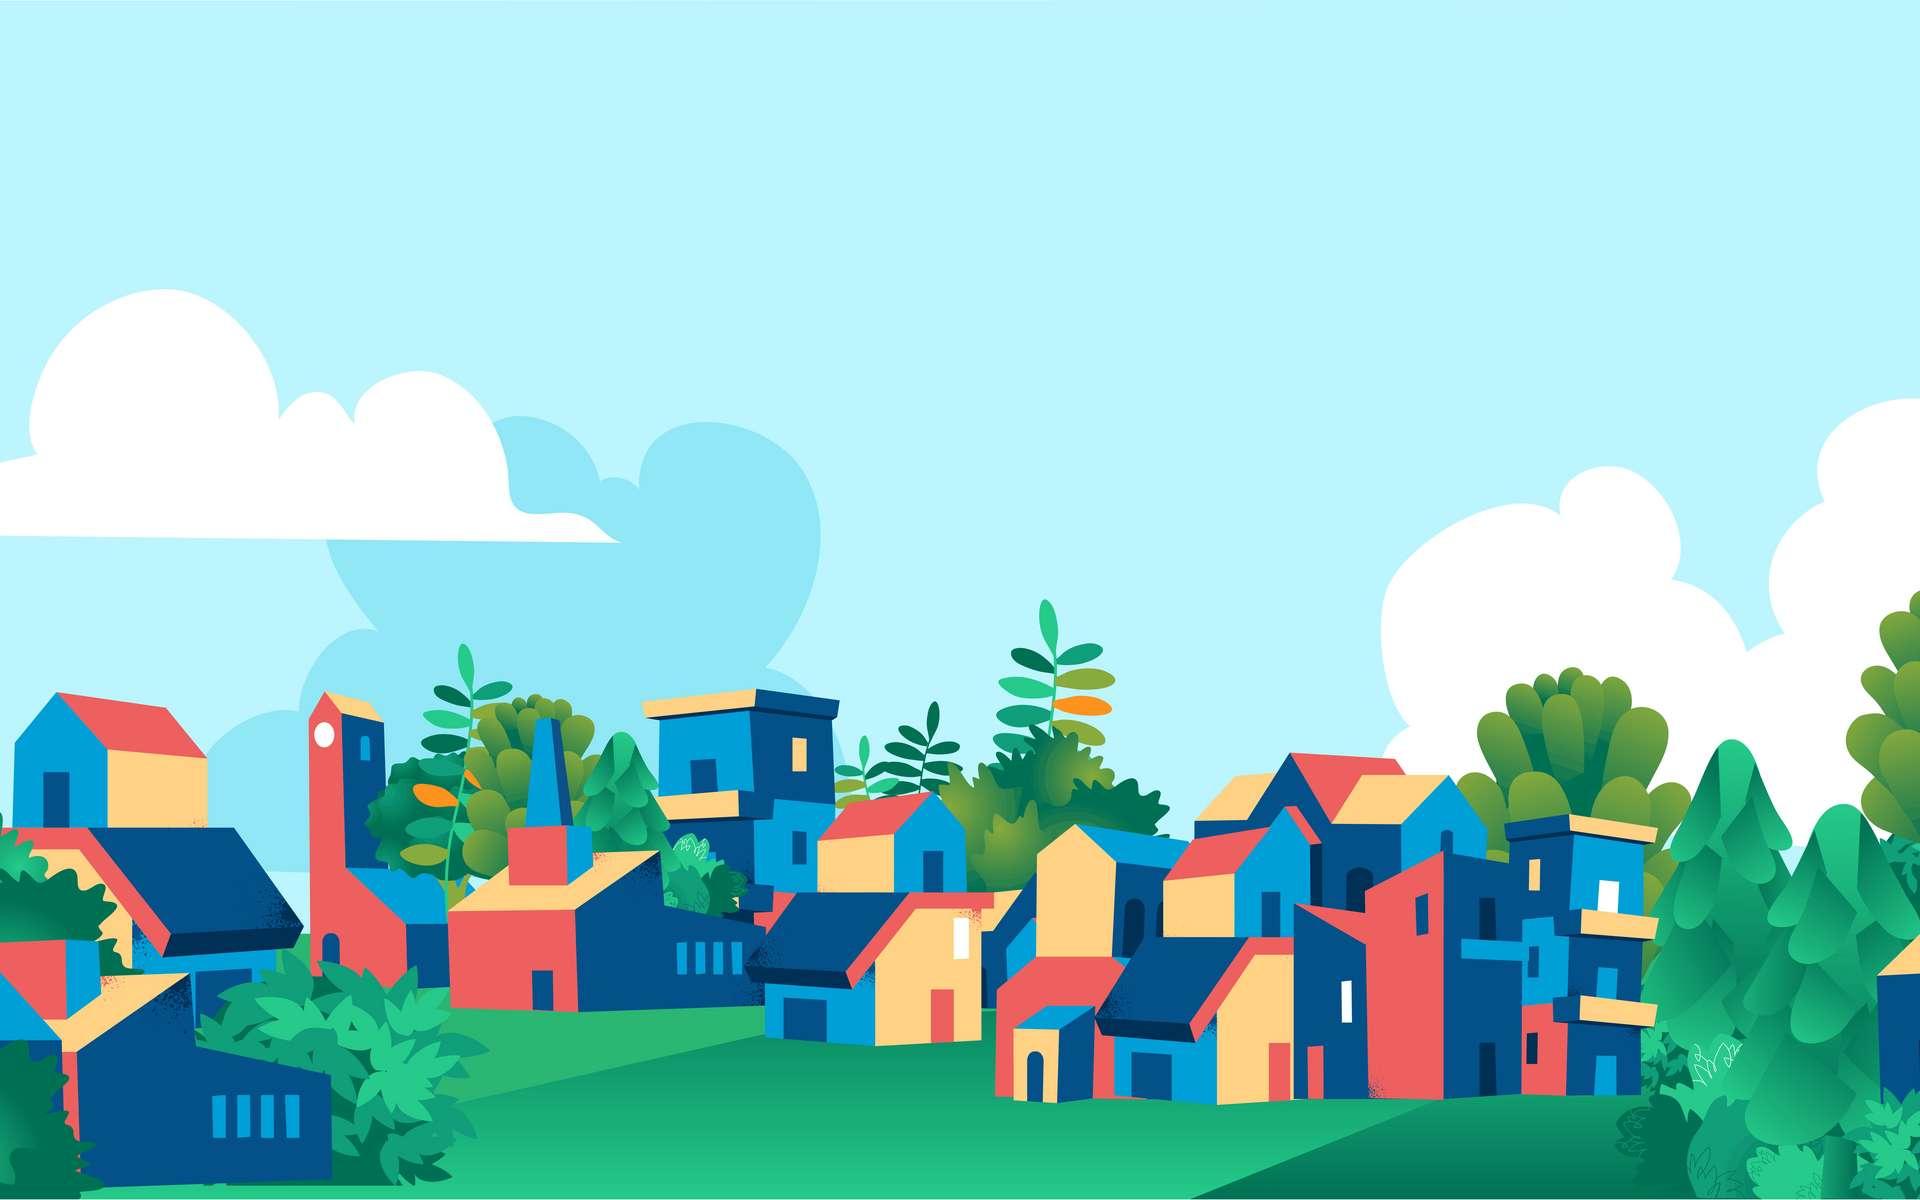 Le logement de demain sera-t-il collectif et modulable ? © Hurca!, Adobe Stock